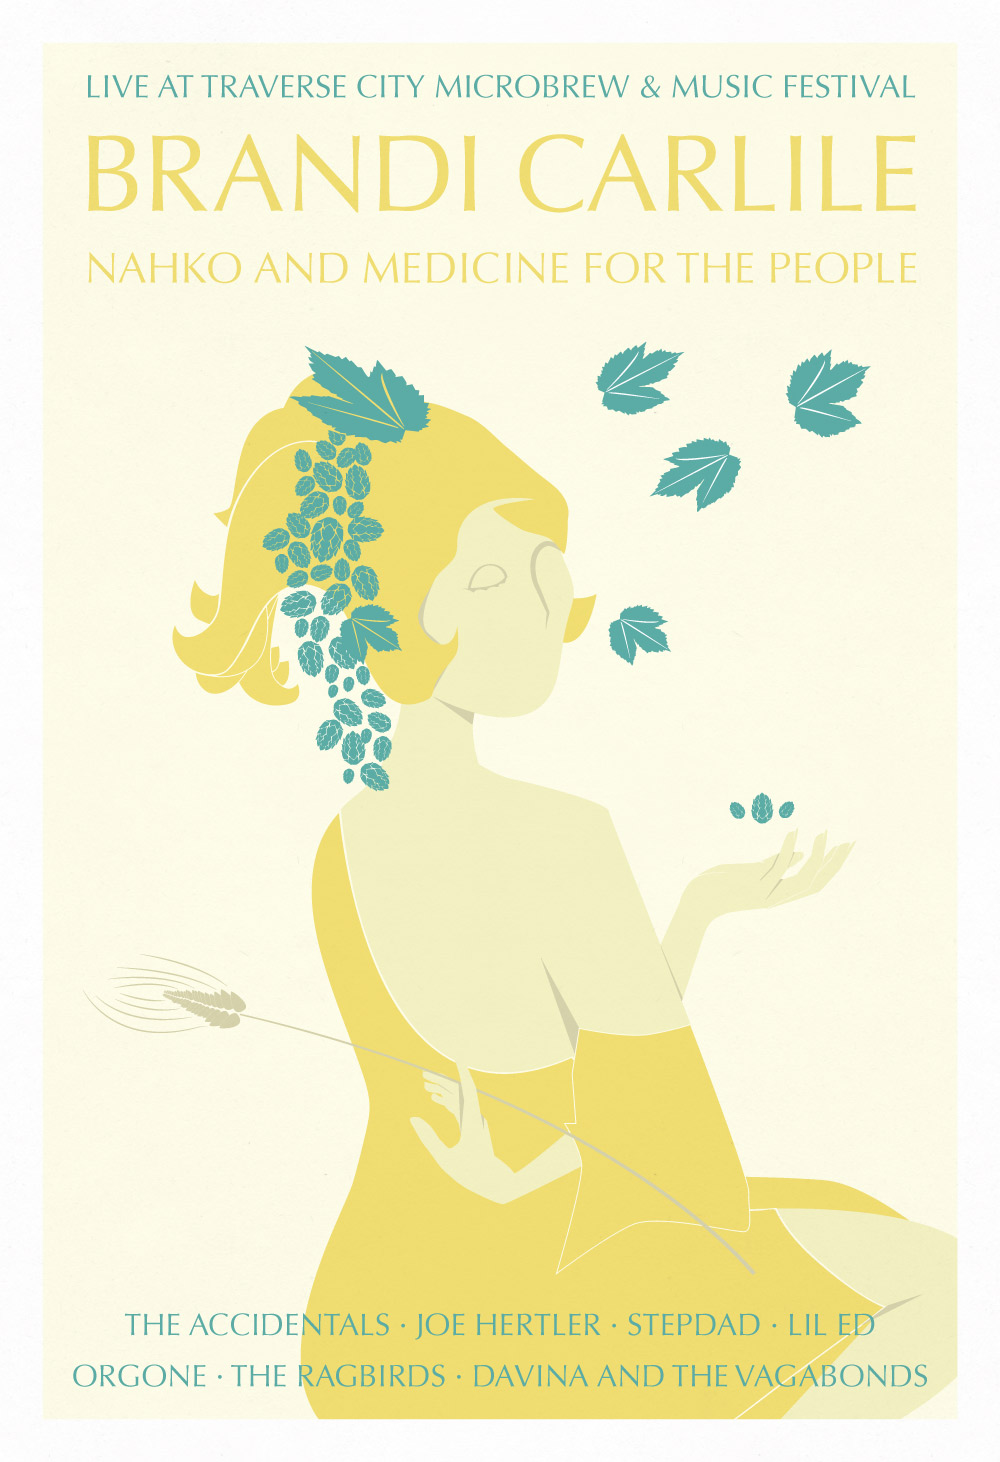 Brandi Carlile Gig Poster